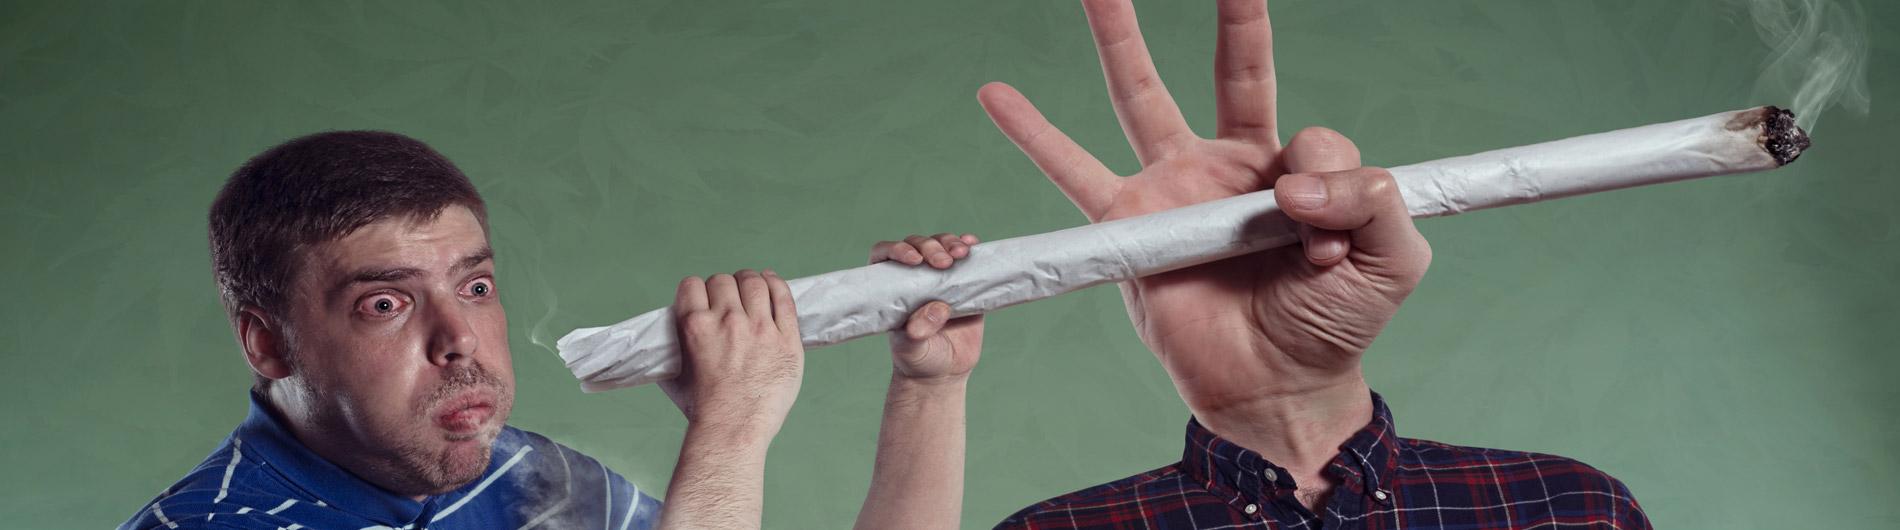 Future of illicit drug use: Future of crime